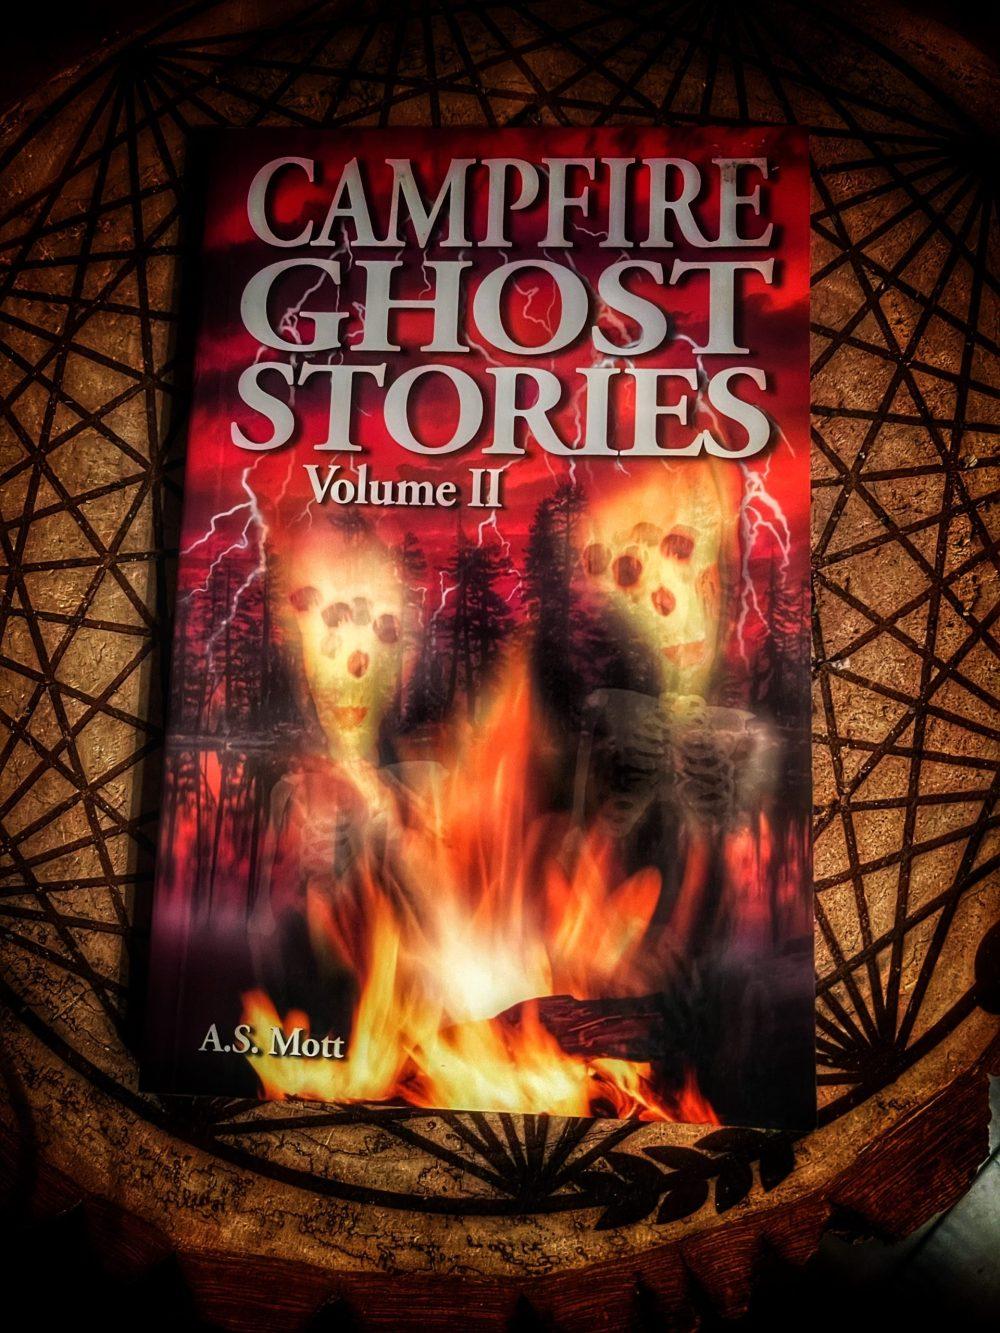 Campfire Ghost Stories Volume 2